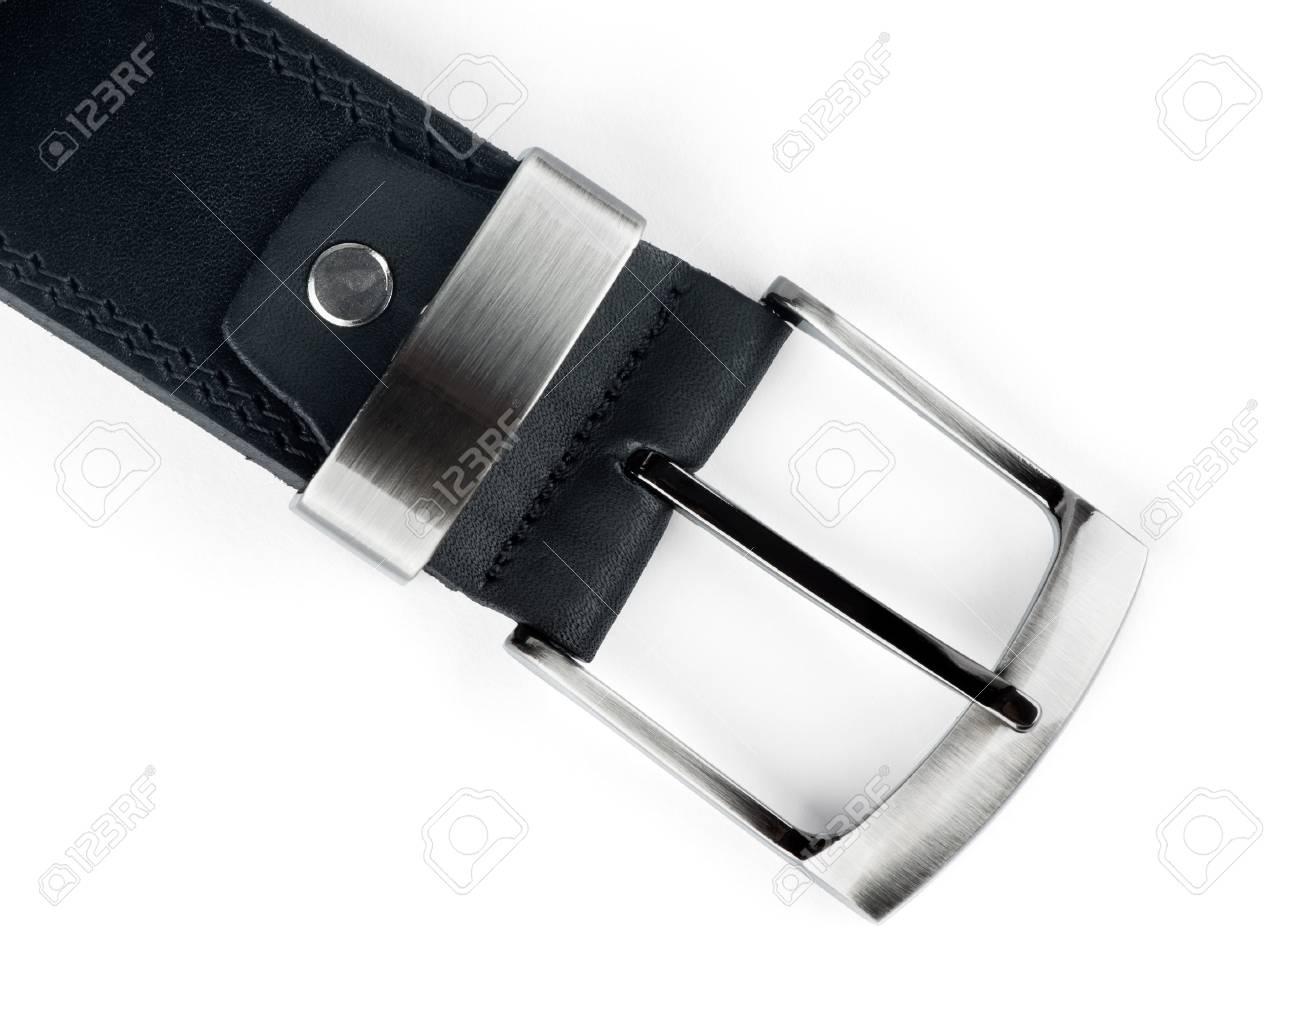 Belt buckle on white background Stock Photo - 15476901